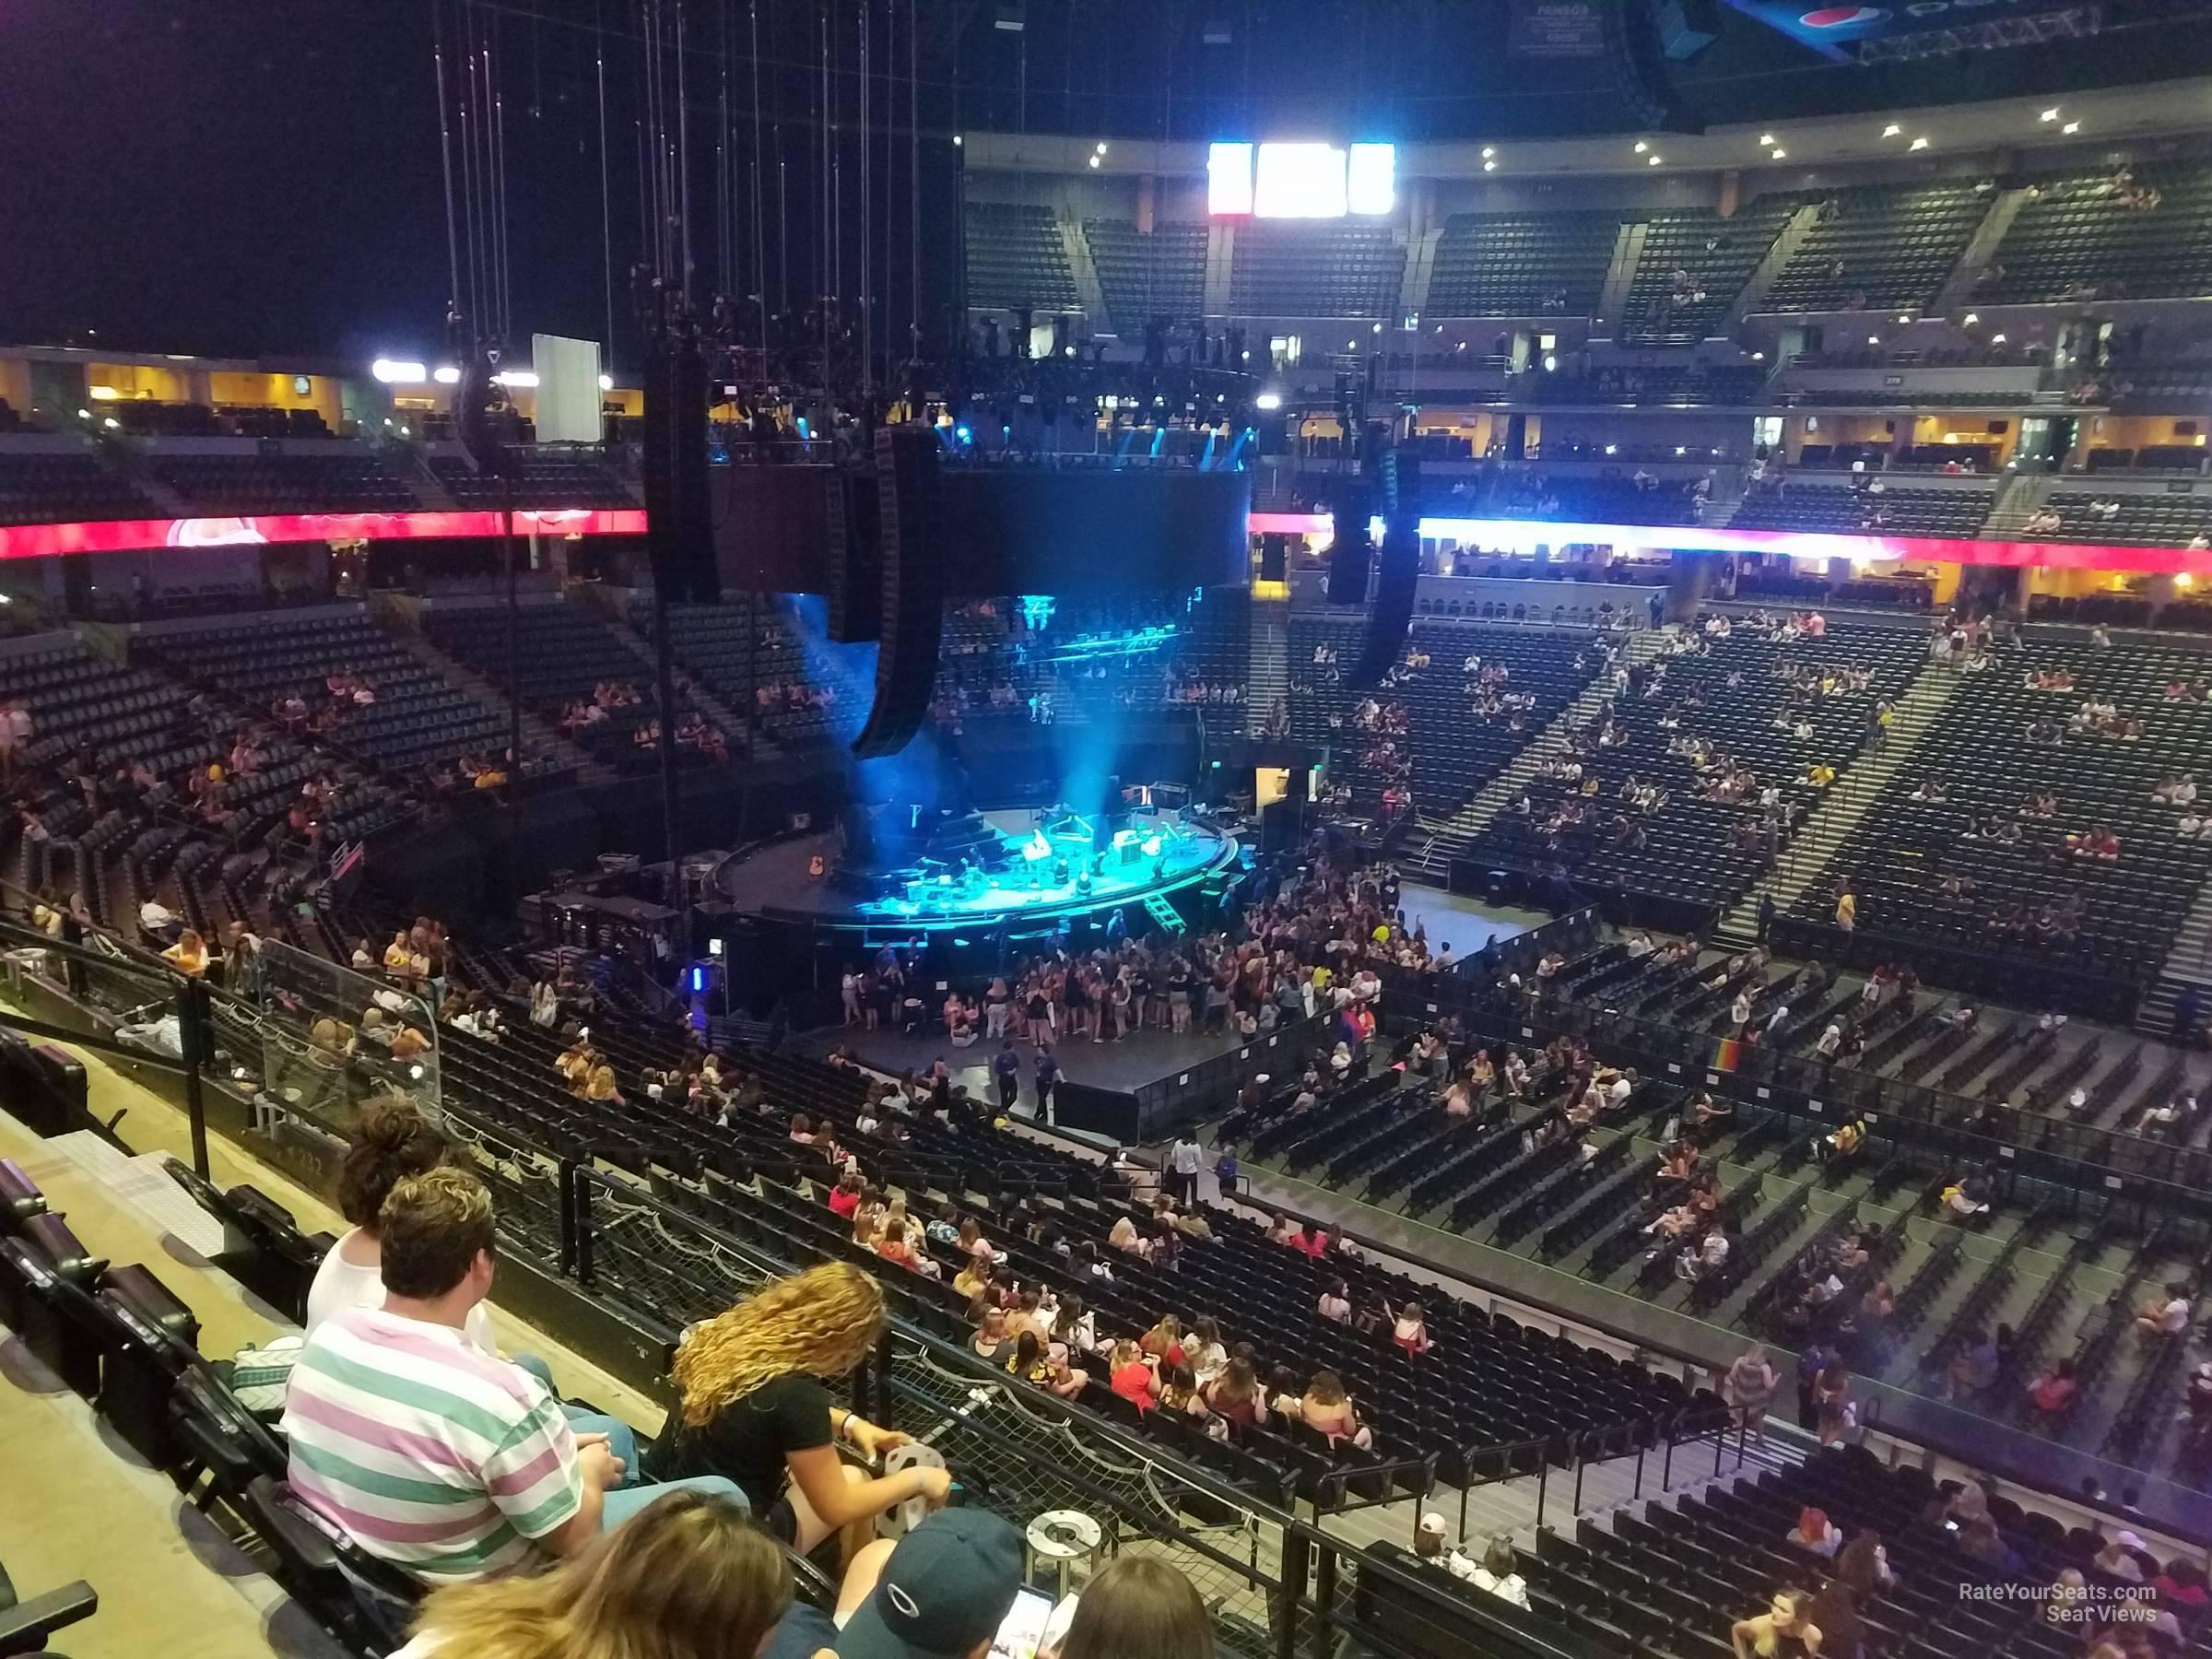 Pepsi Center Section 230 Concert Seating Rateyourseatscom